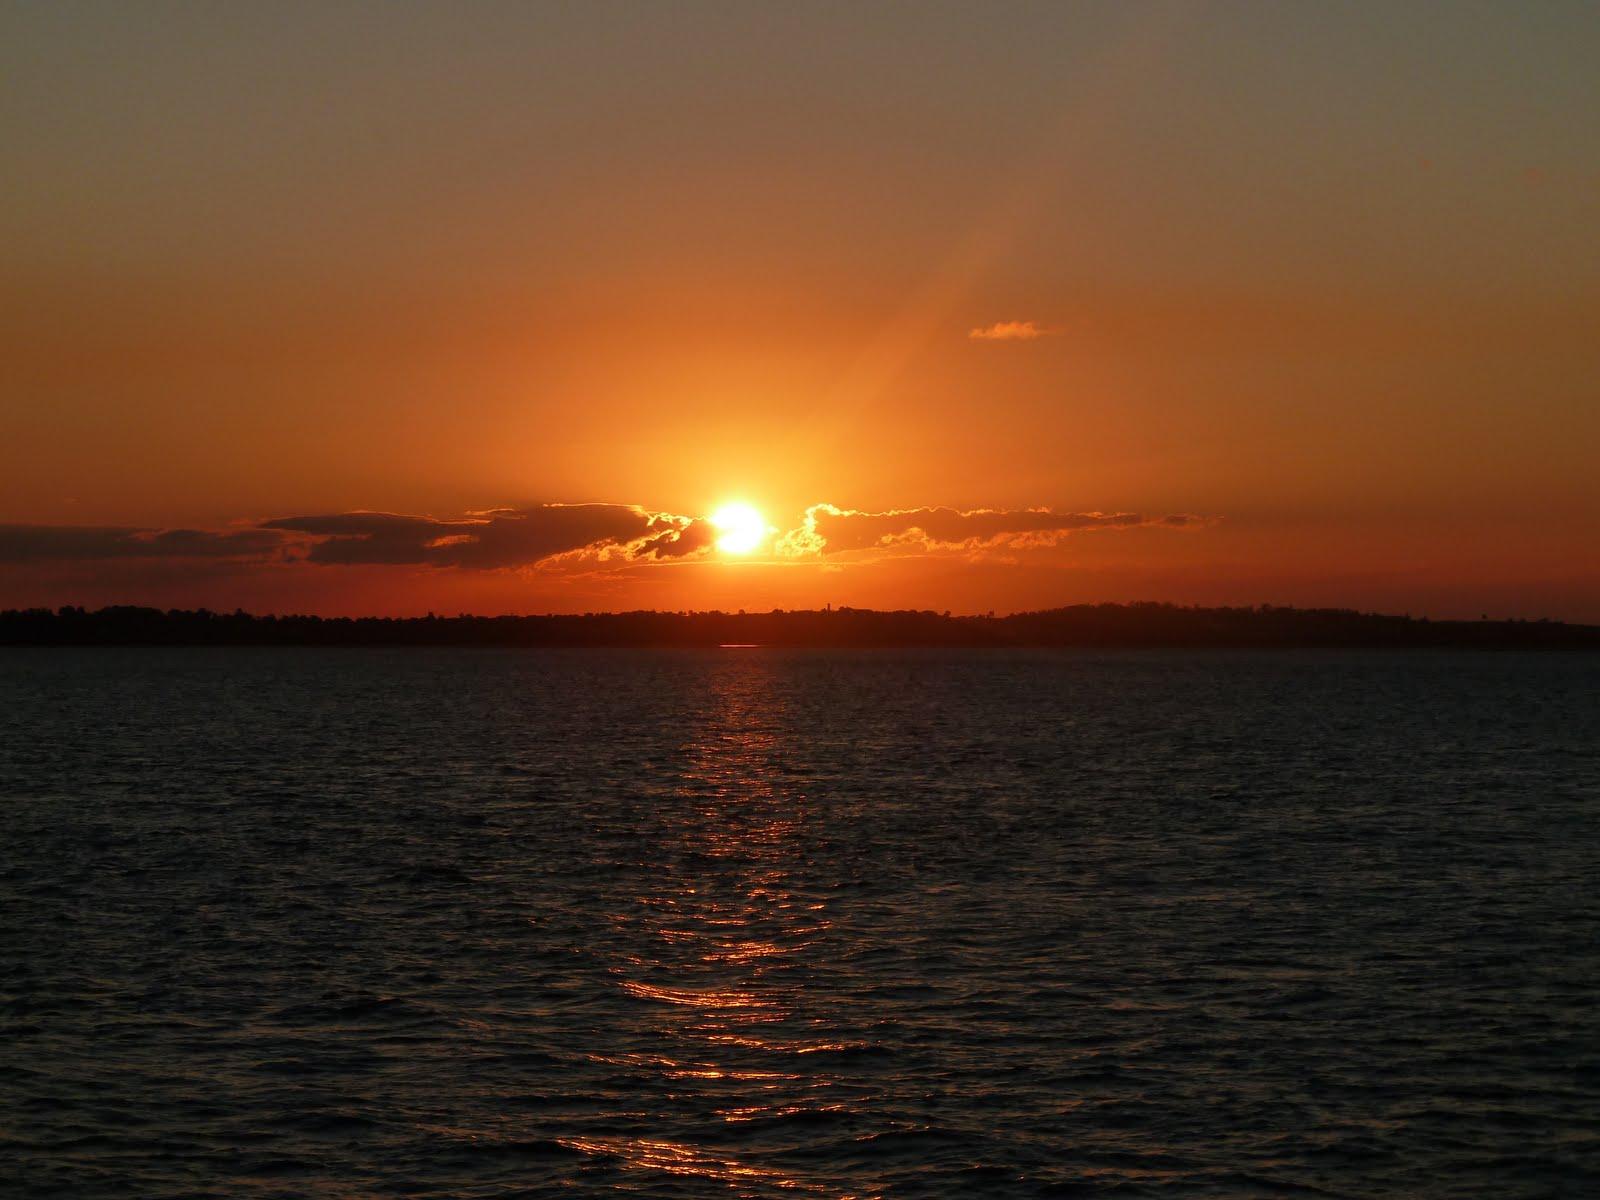 Oulongadas por el mundo: Hervey Bay - Día 2